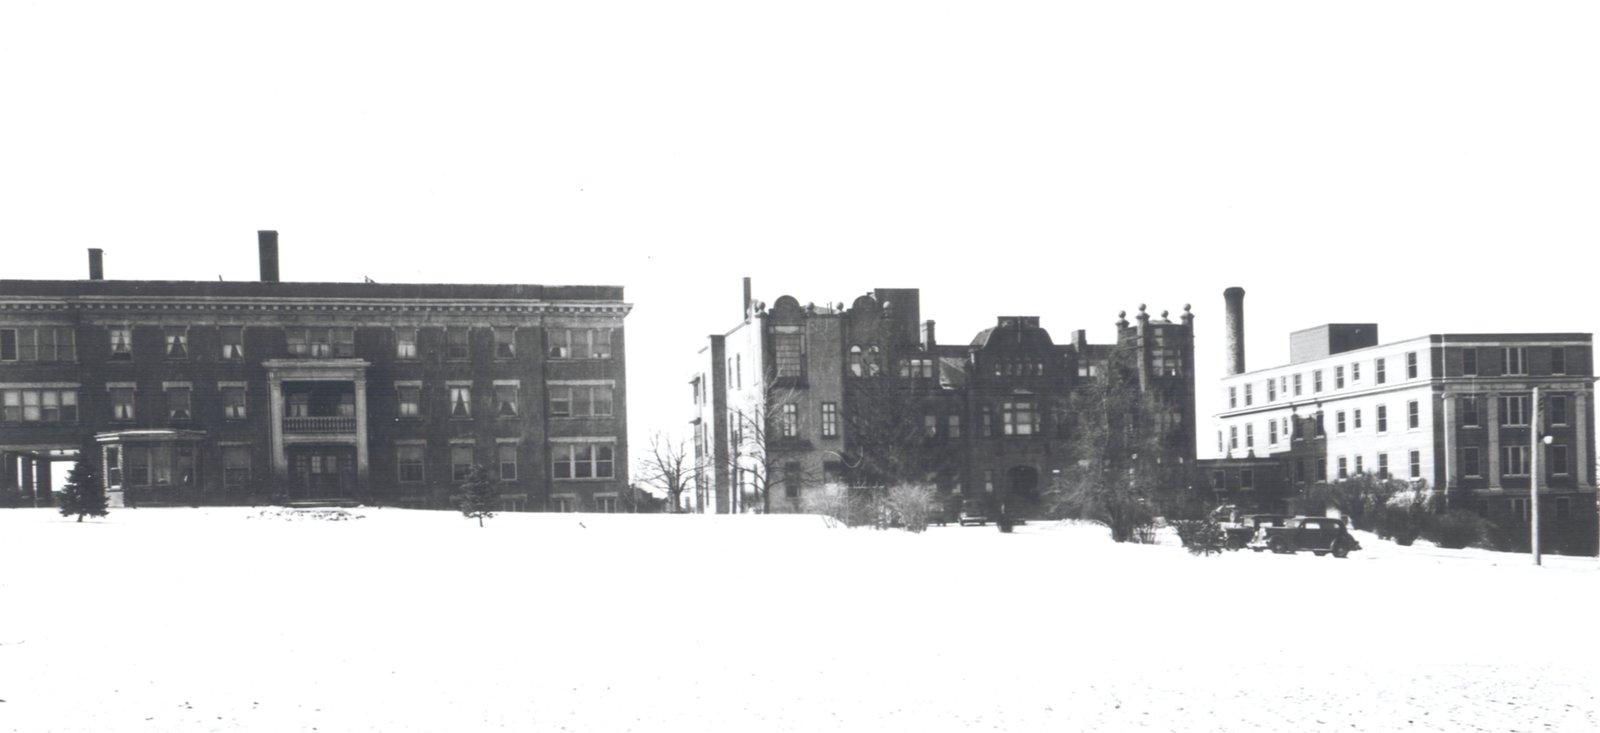 Full Image View: Kitchener-Waterloo Hospital, Kitchener, Ontario ...